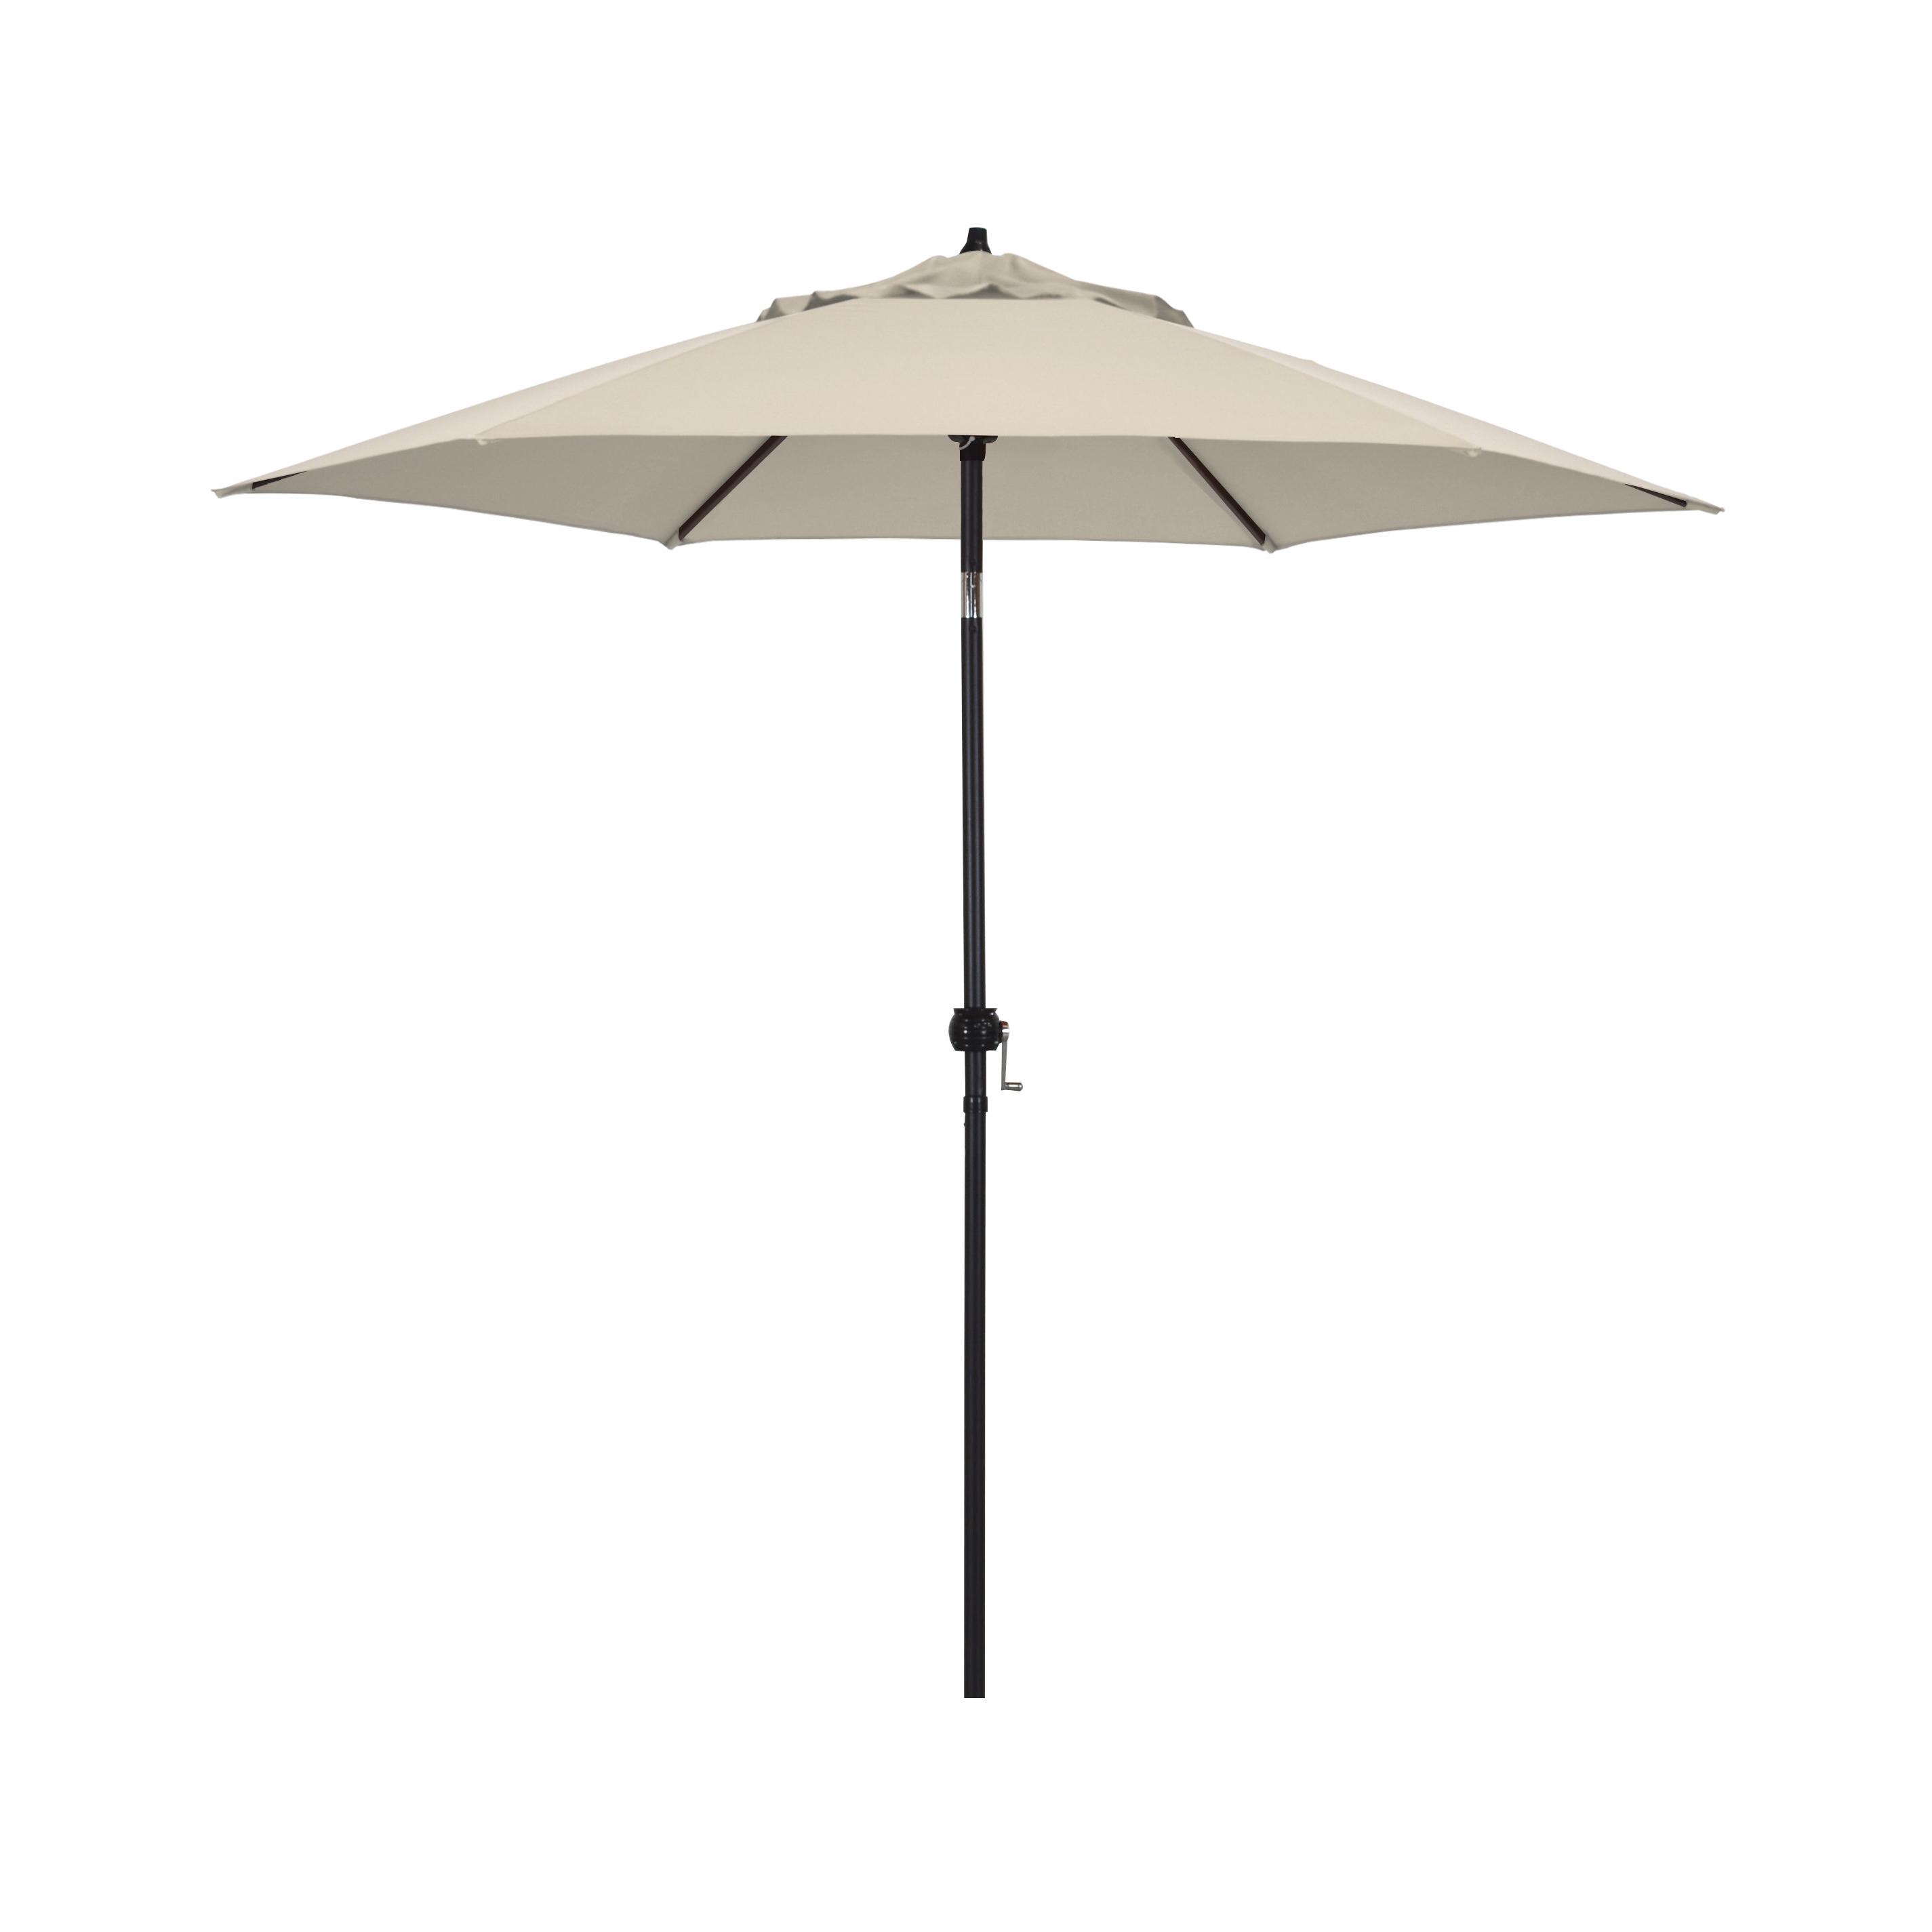 Bradford Patio Market Umbrellas Regarding Fashionable Beachcrest Home Kearney 9' Market Umbrella (View 9 of 20)